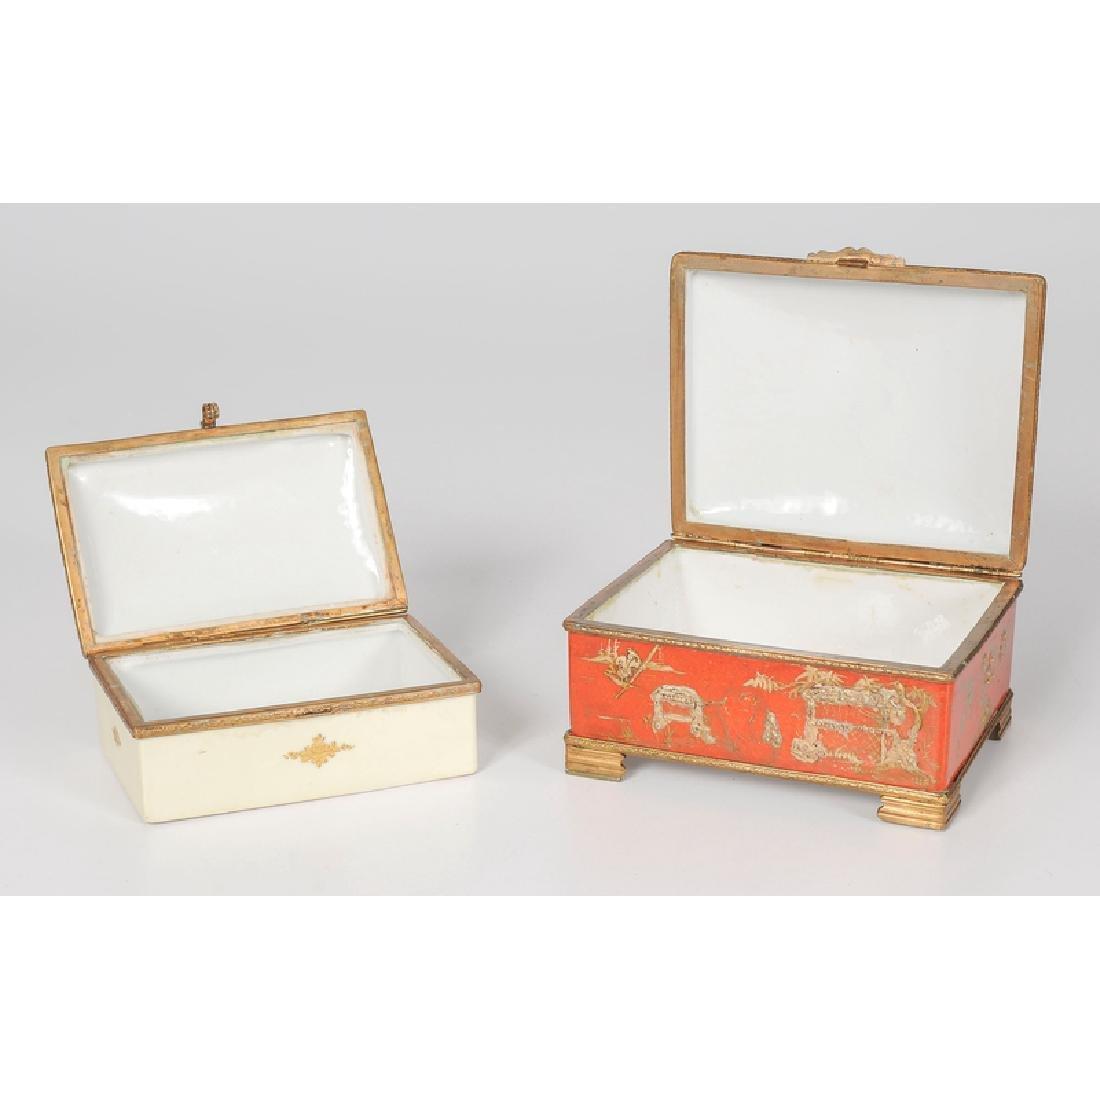 French Porcelain Dresser Boxes - 2